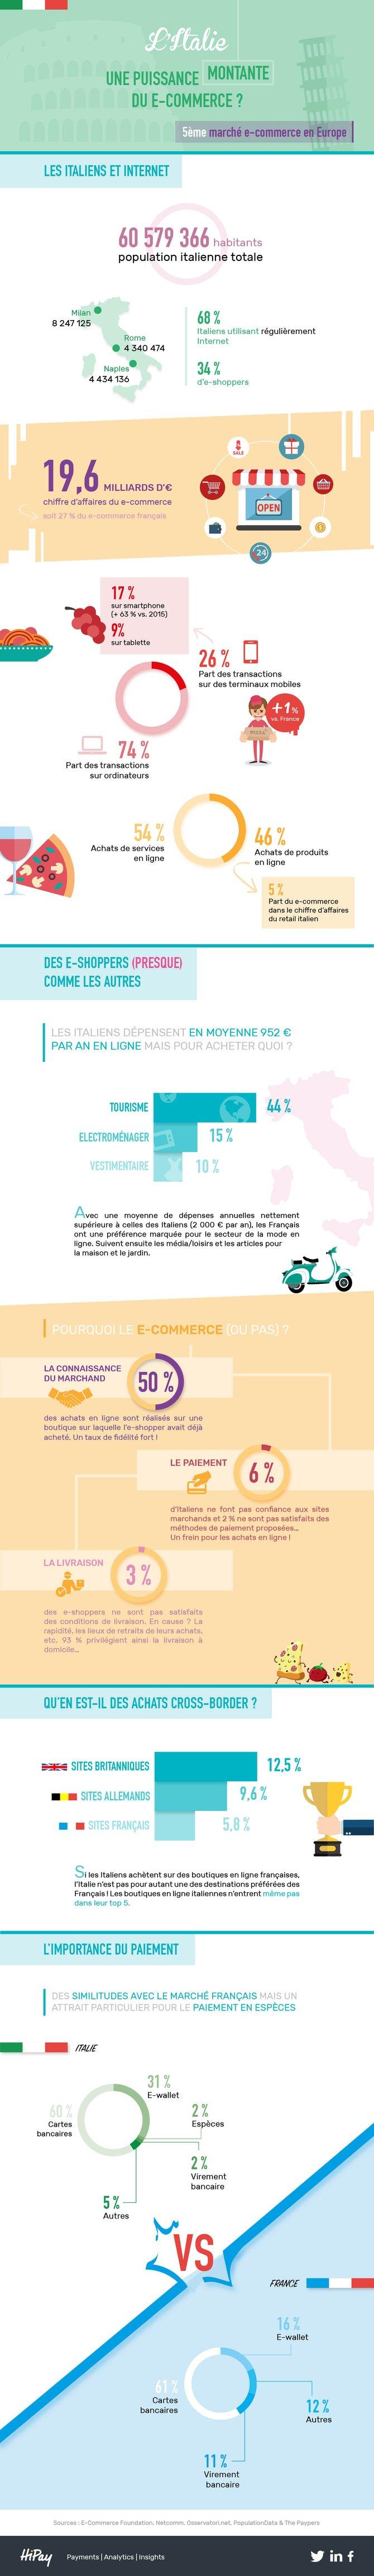 infographie_ecommerce_italie.jpg